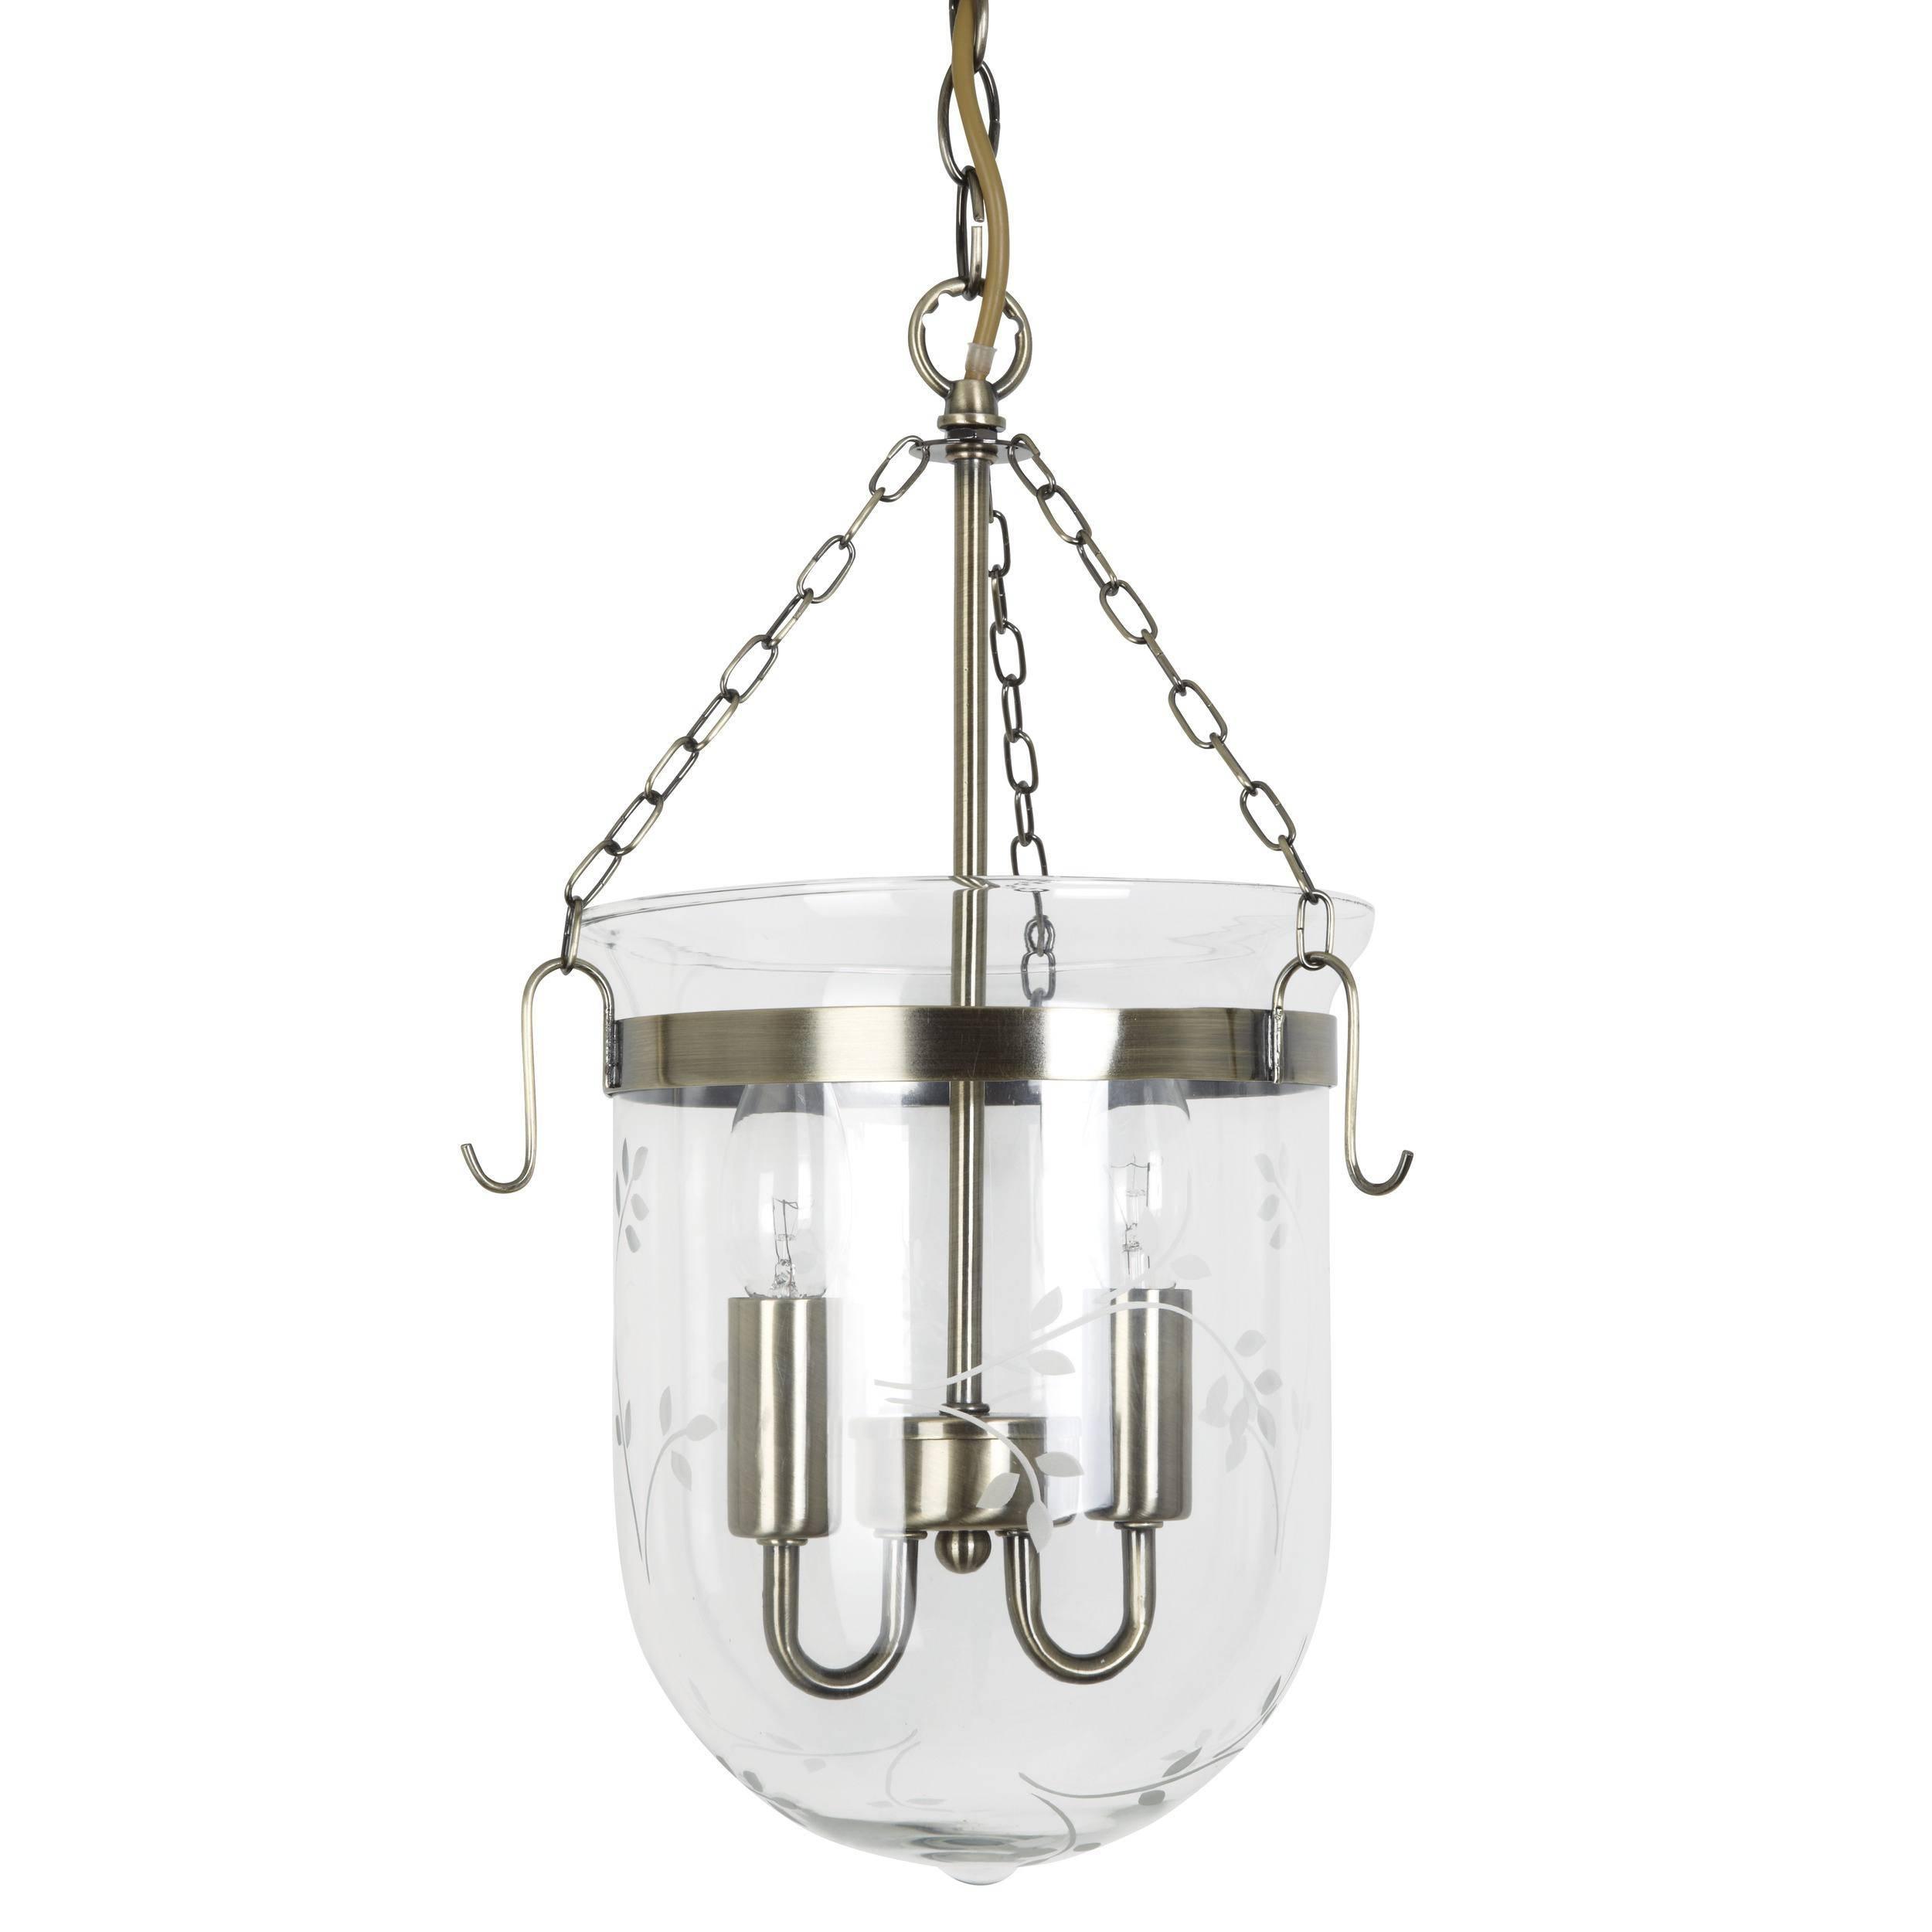 Sea Glass Pendant Lights As Well Berwick And Brass Light At Laura with Sea Glass Pendant Lights (Image 12 of 15)